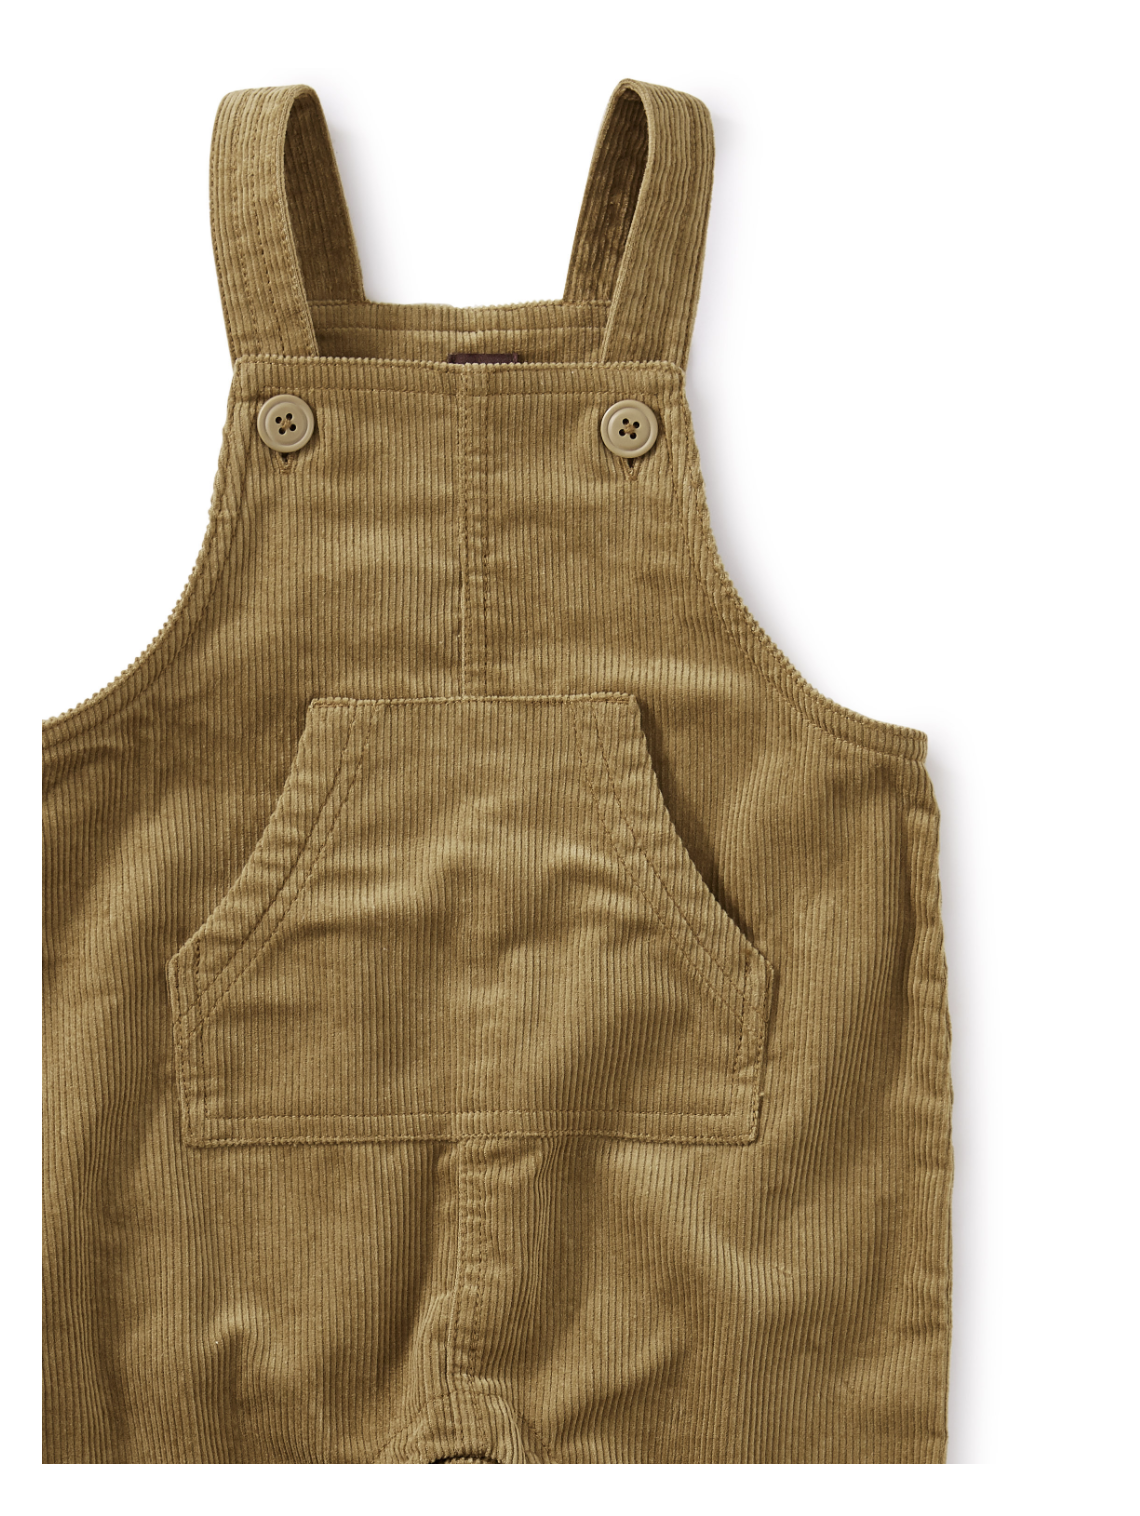 Tea Collection Corduroy Baby Overalls - Umber